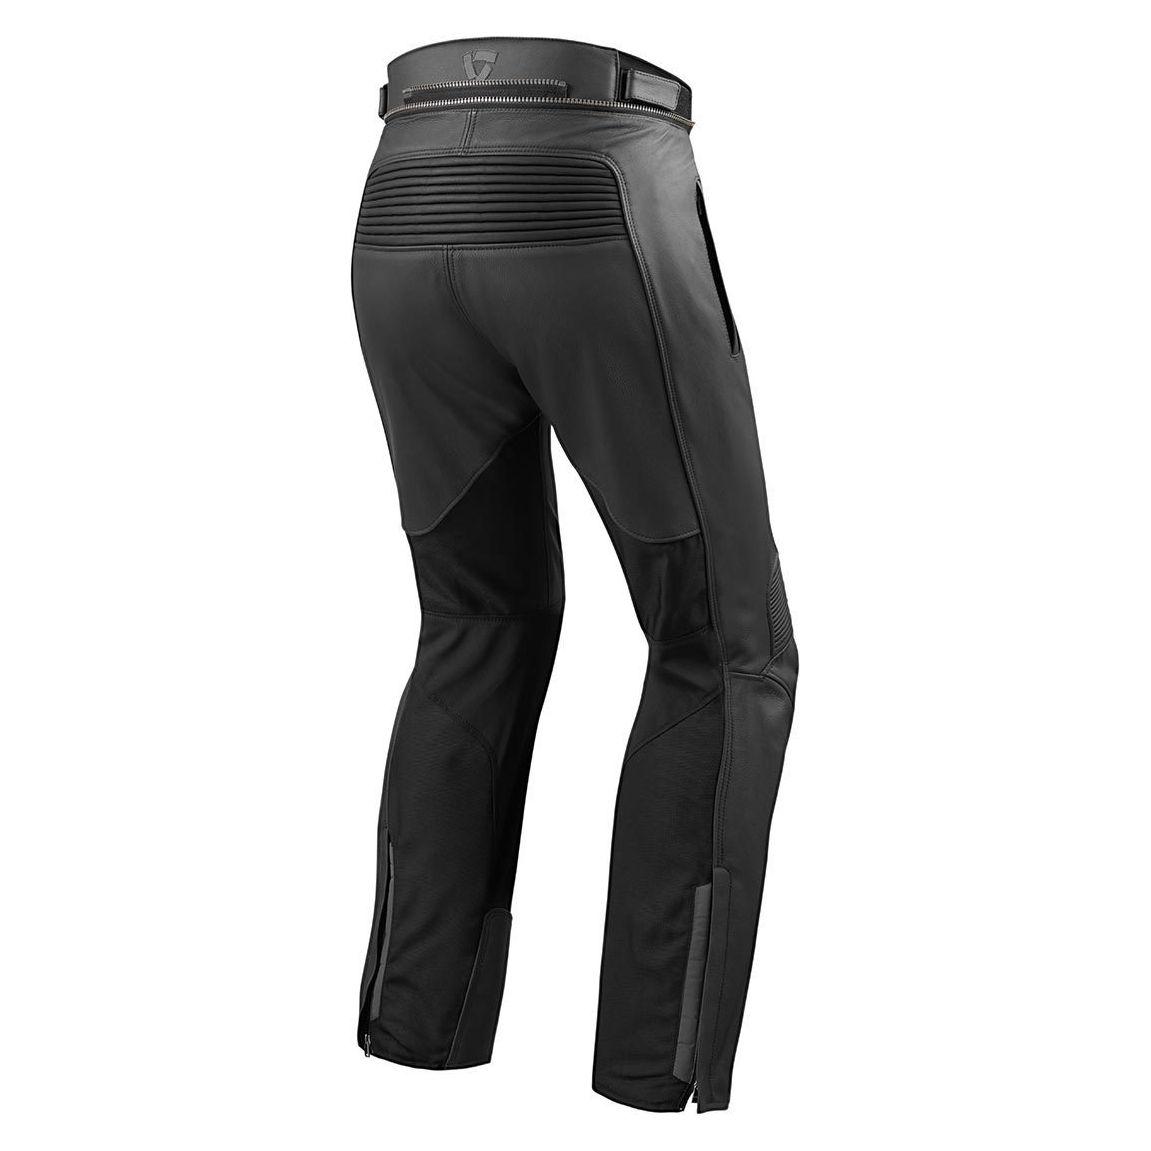 Pantaloni Rev'it IGNITION 3 in pelle impermeabili e